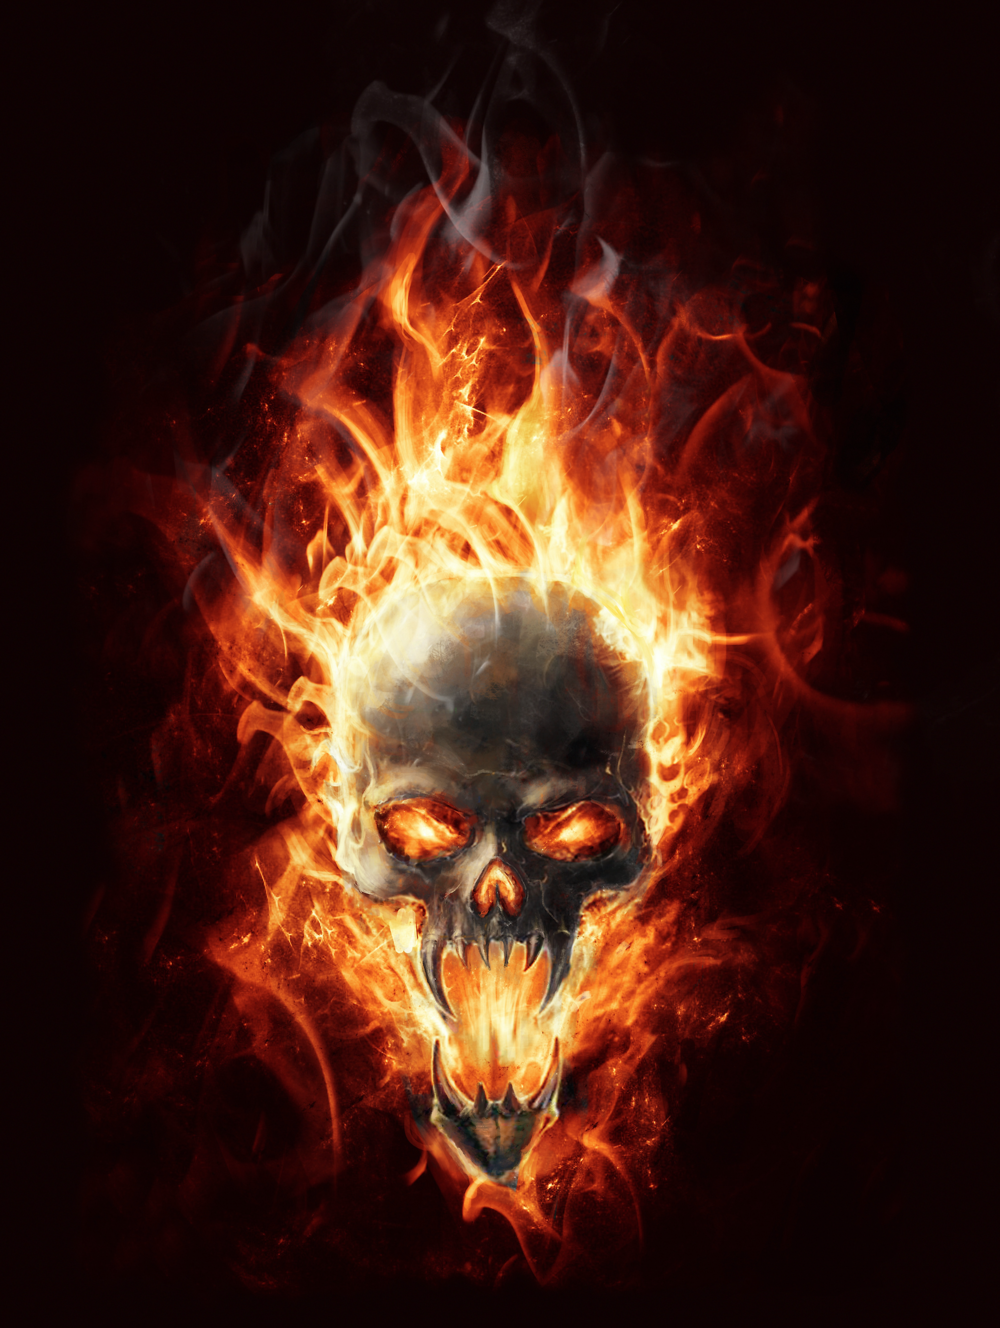 Flaming Skull Door Wrap Rm Wraps In 2020 Skull Wallpaper Skull Artwork Skull Pictures